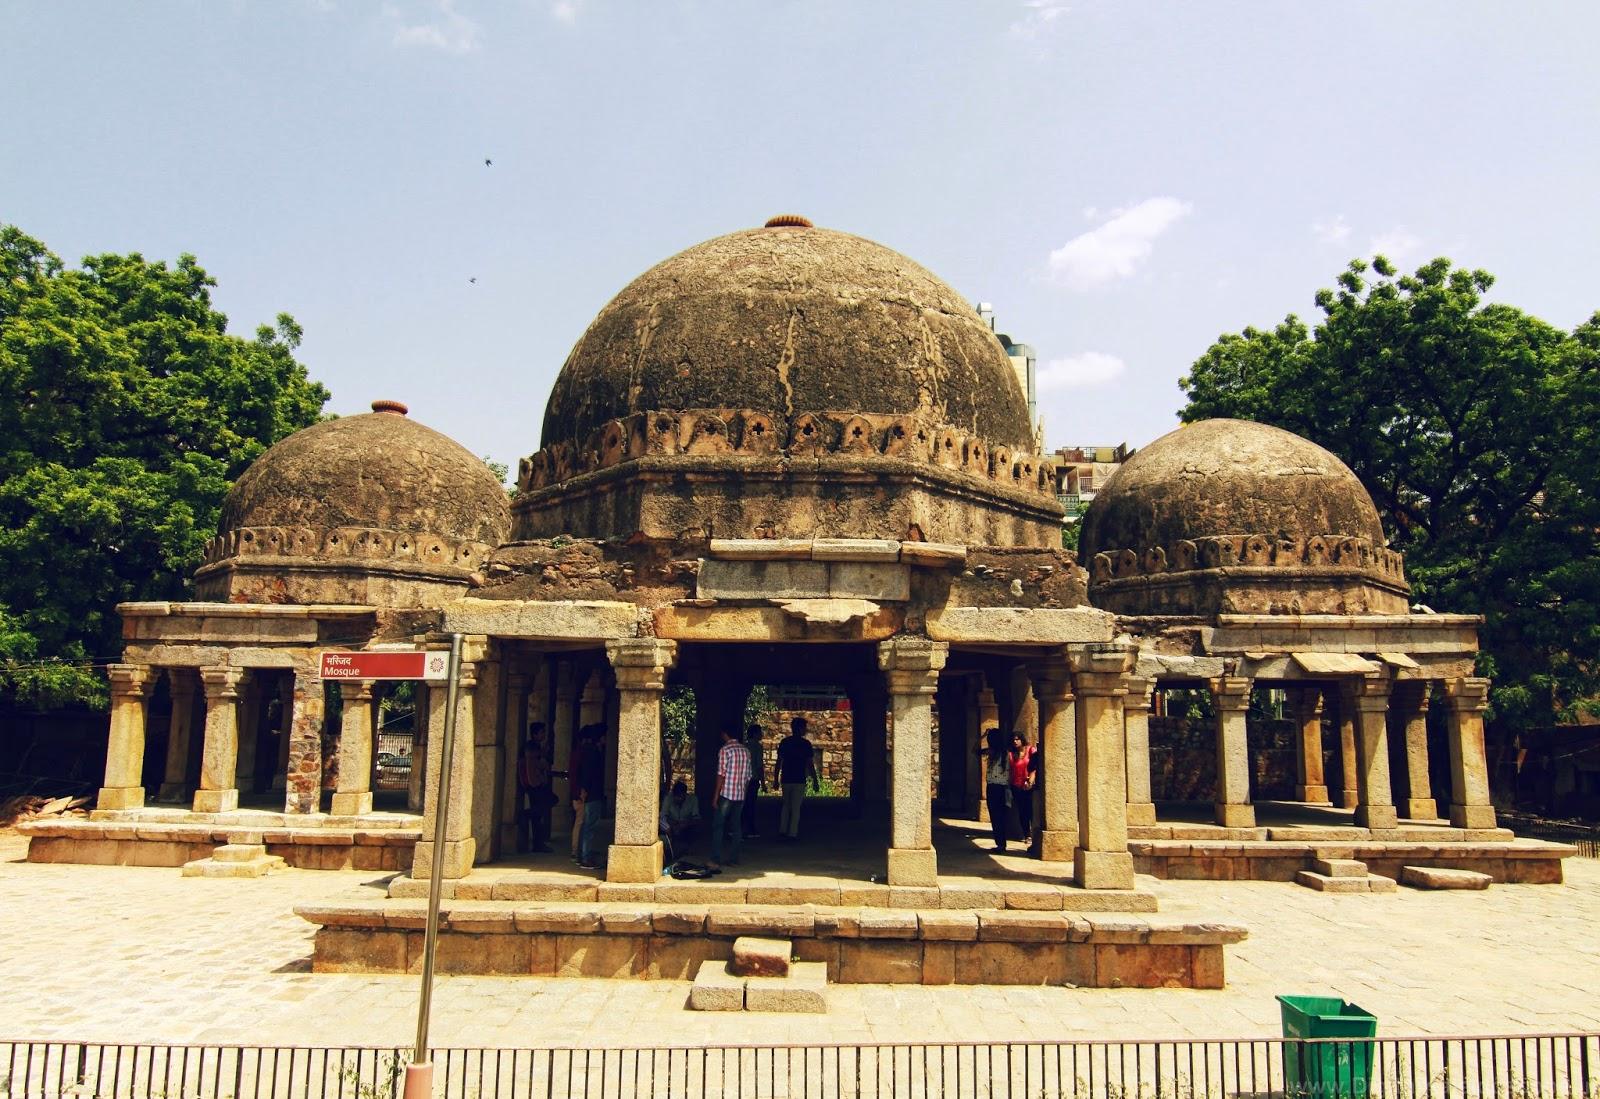 Hauz Khas Heritage site